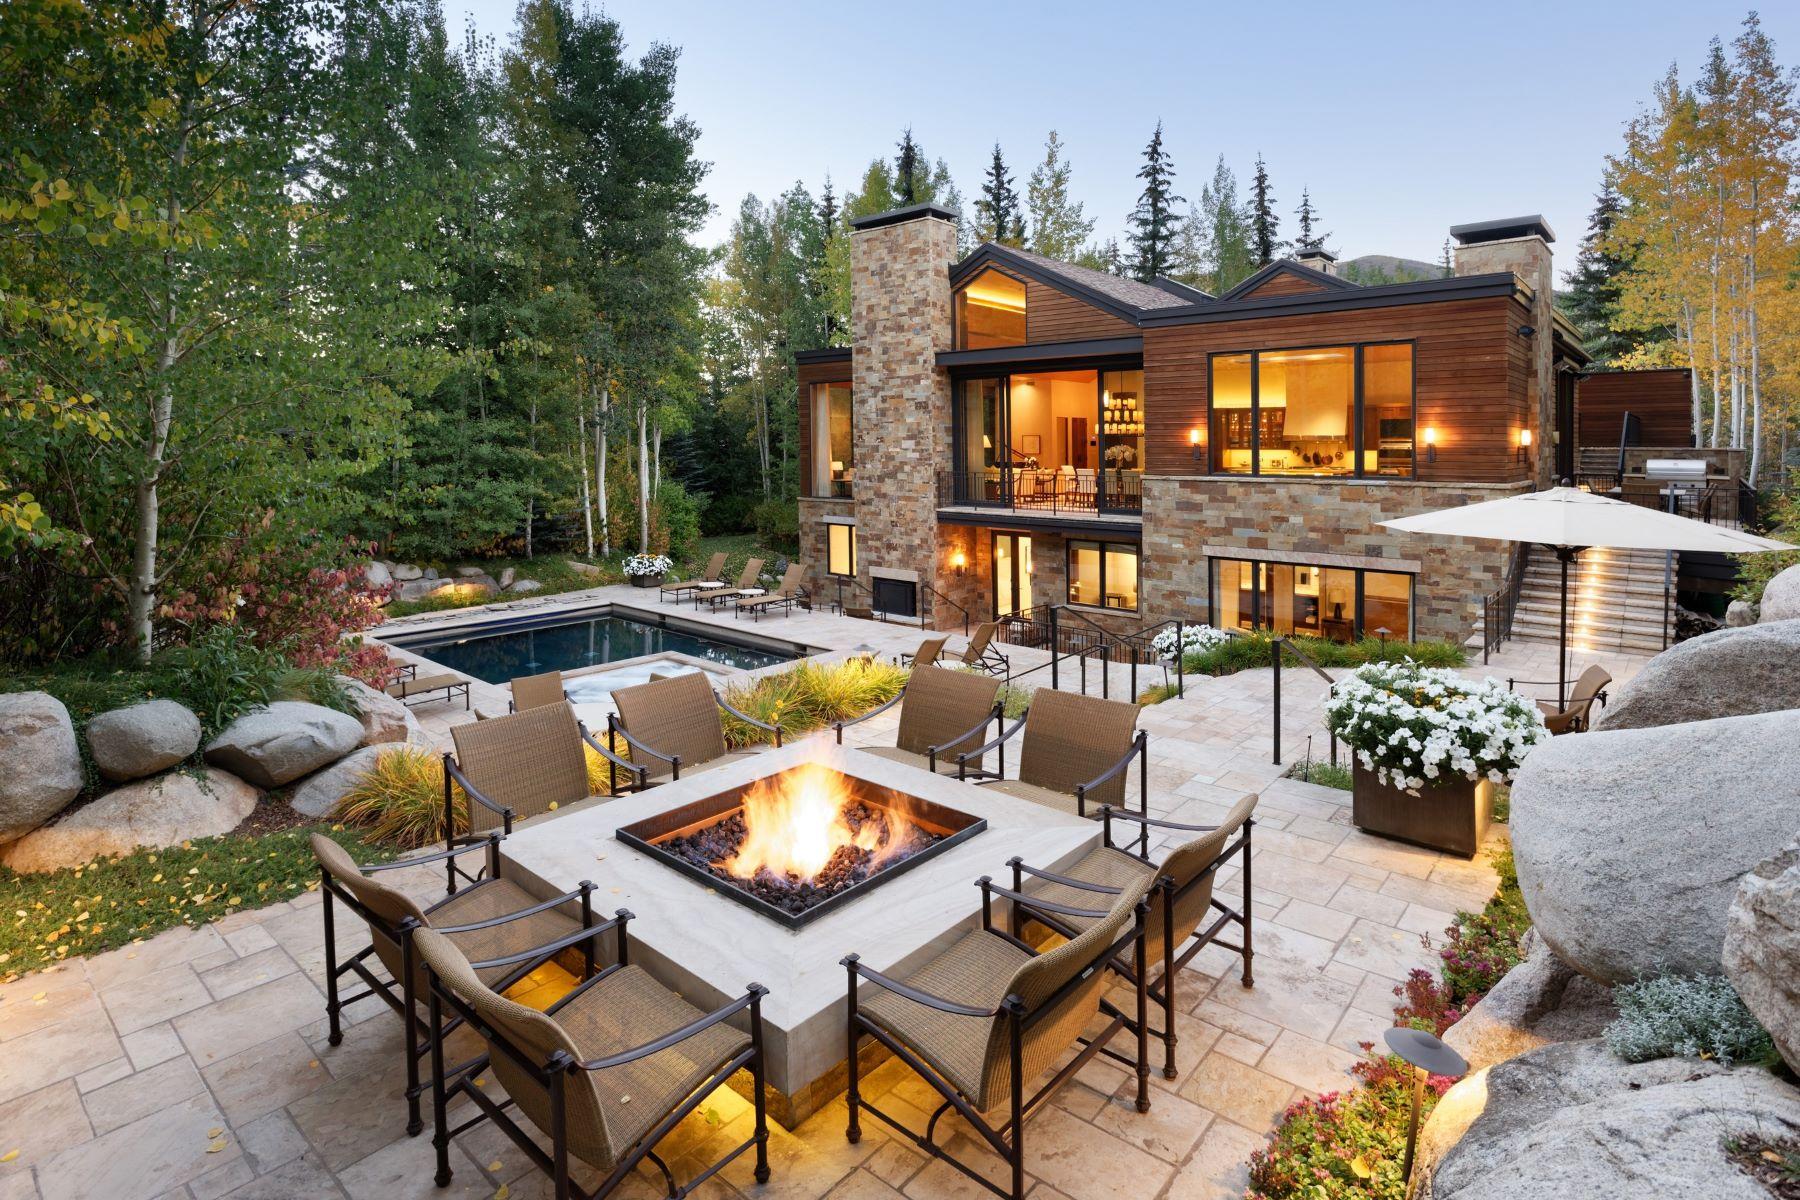 Single Family Homes для того Продажа на In-town Living at its Finest 8 Ute Place, А́спен, Колорадо 81611 Соединенные Штаты